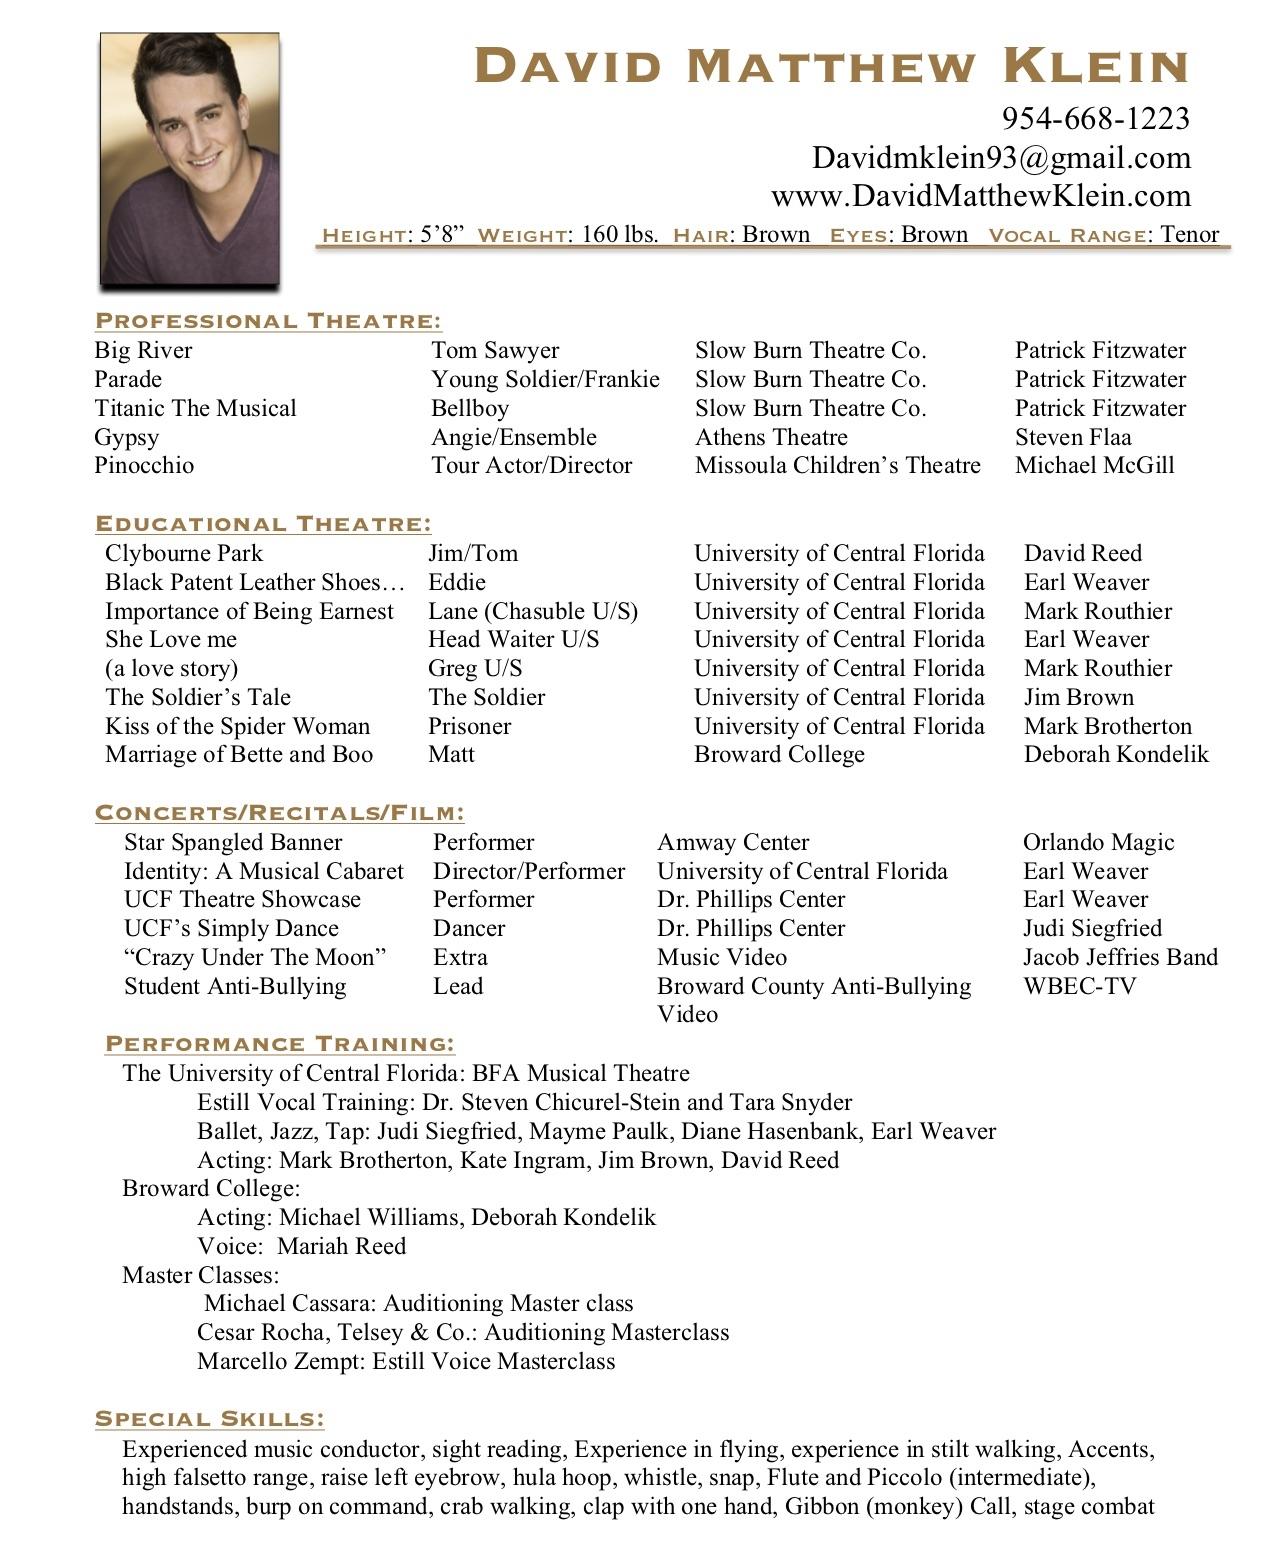 Headshot And Resume David Matthew Klein